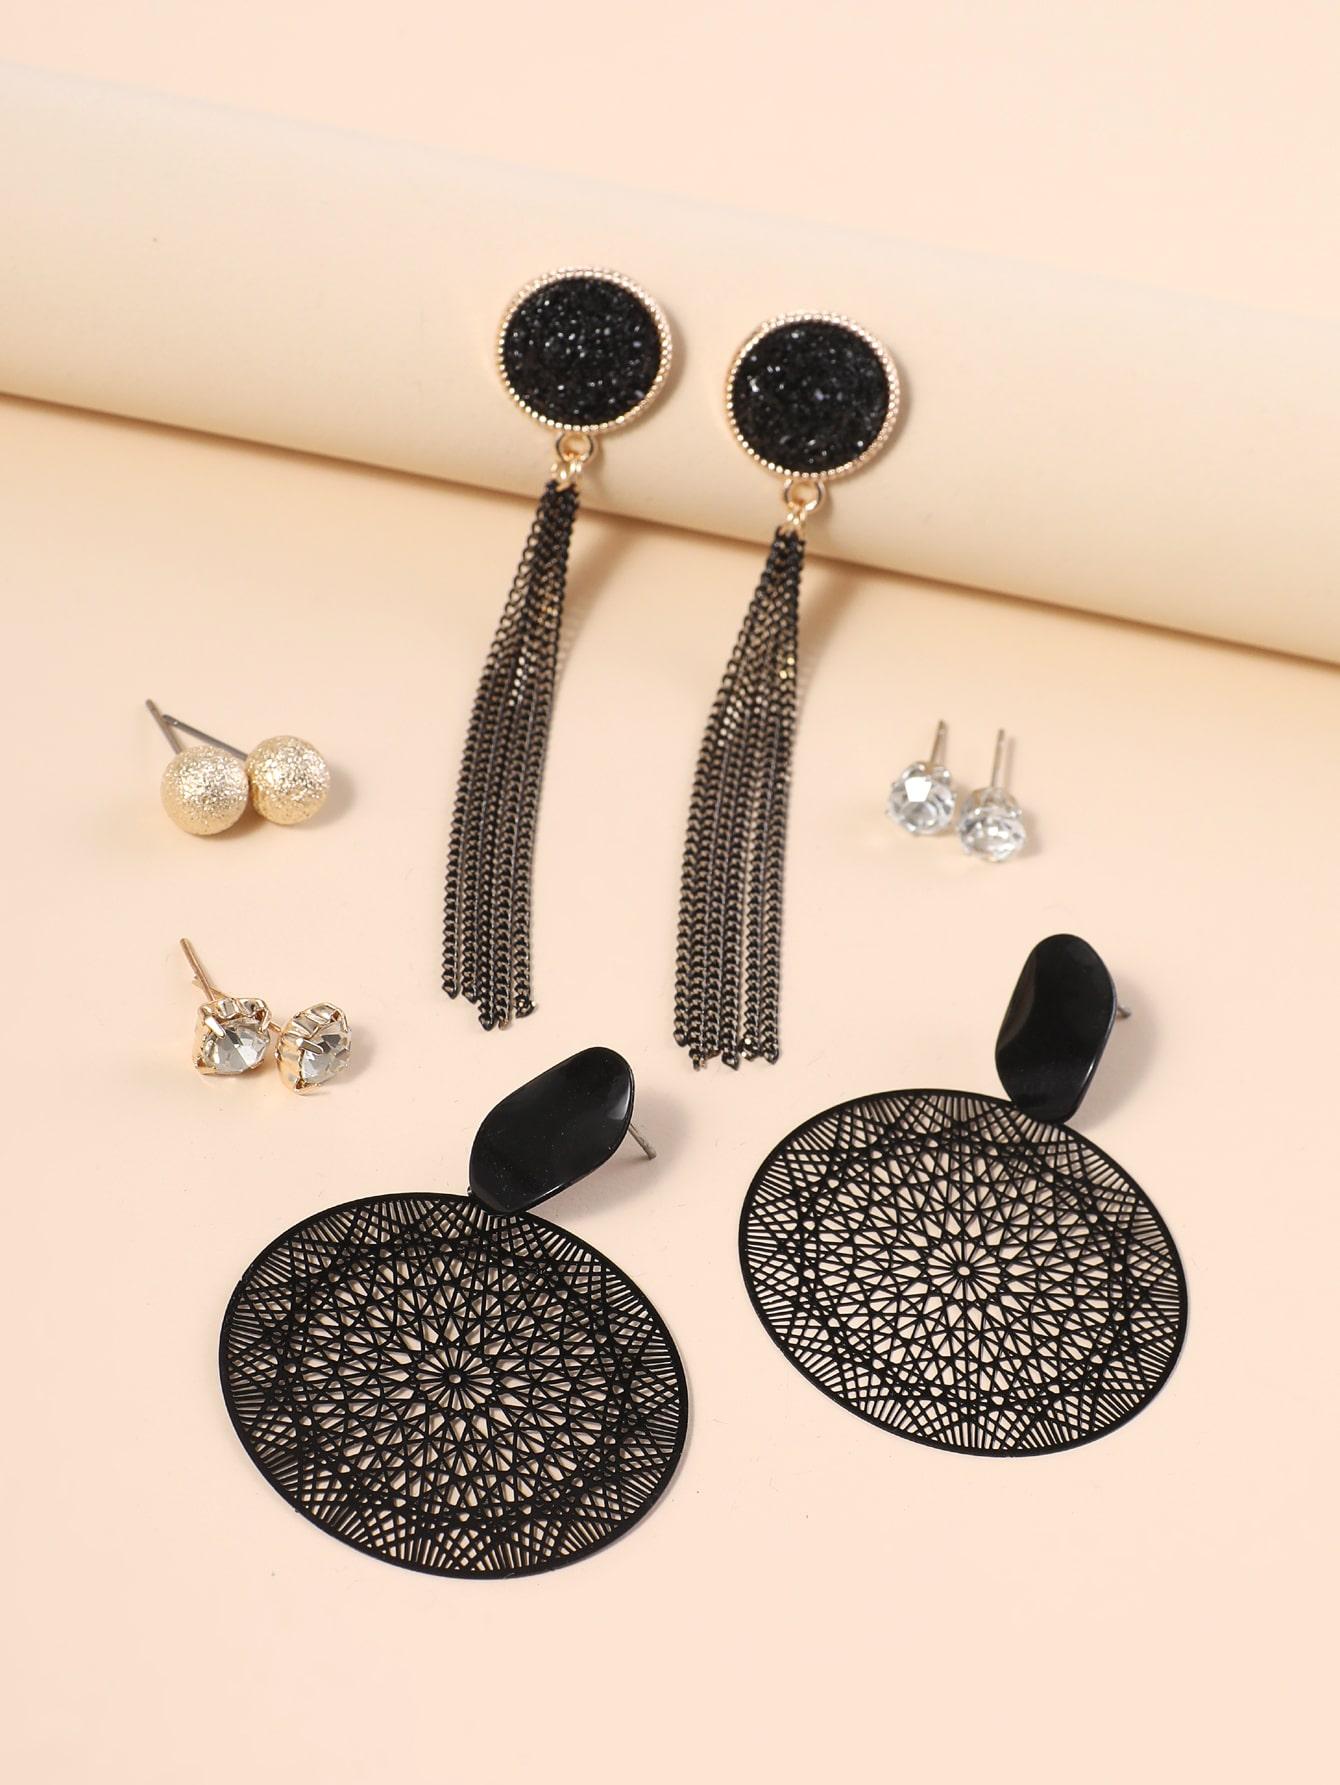 5pairs Rhinestone Detail Metal Tassel Drop Earrings thumbnail